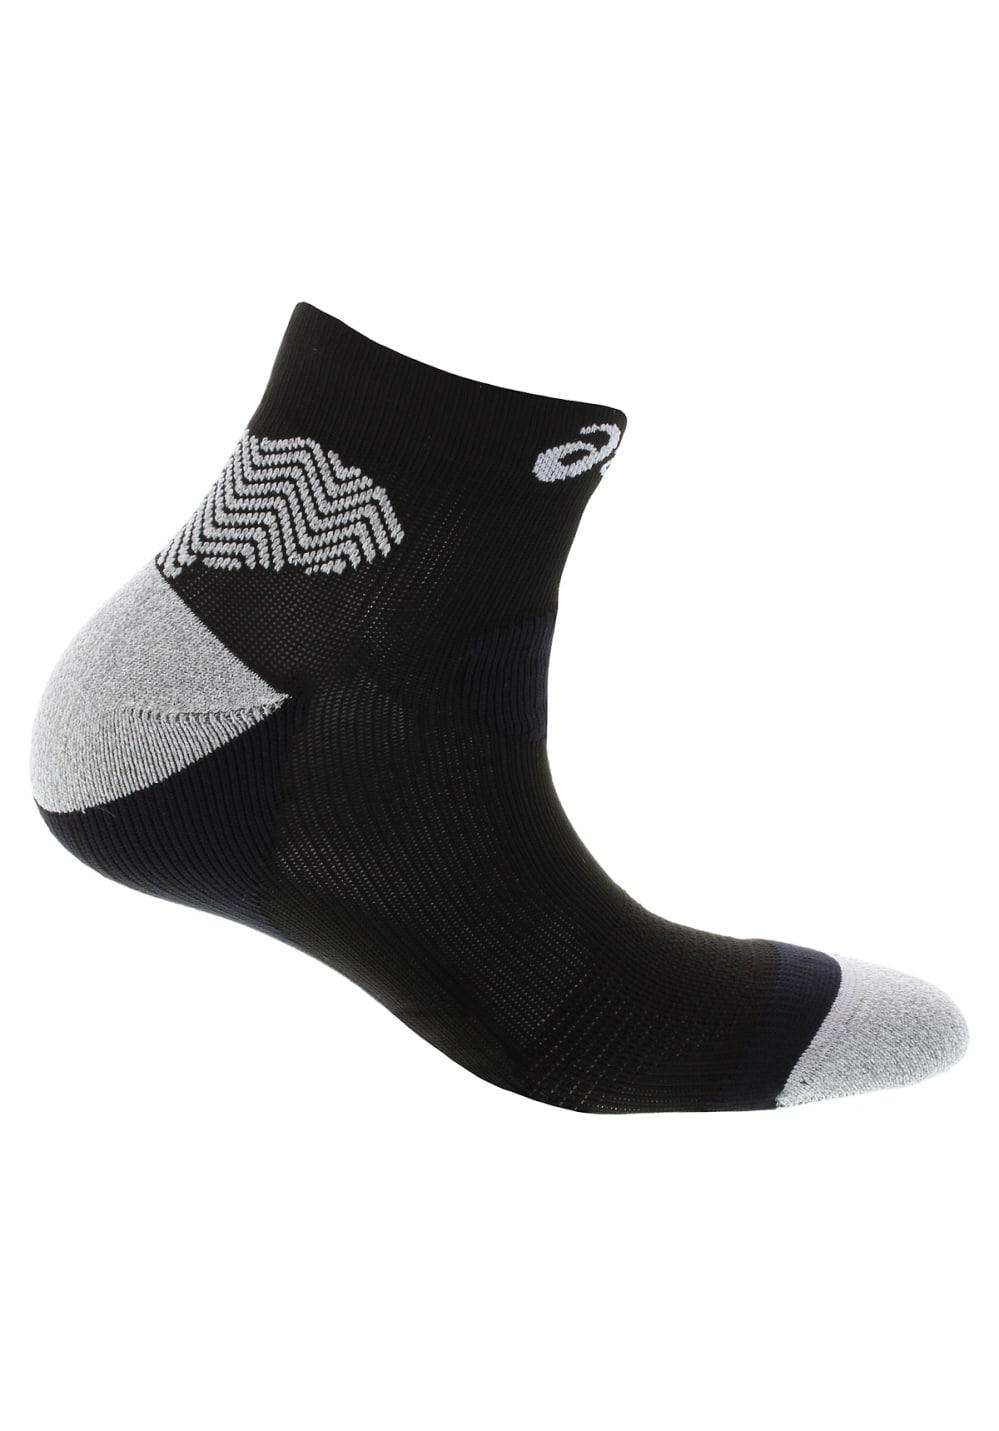 3da44facdfbf ... ASICS Kayano Sock - Running socks - Black. Back to Overview. 1  2  3.  Previous. Next